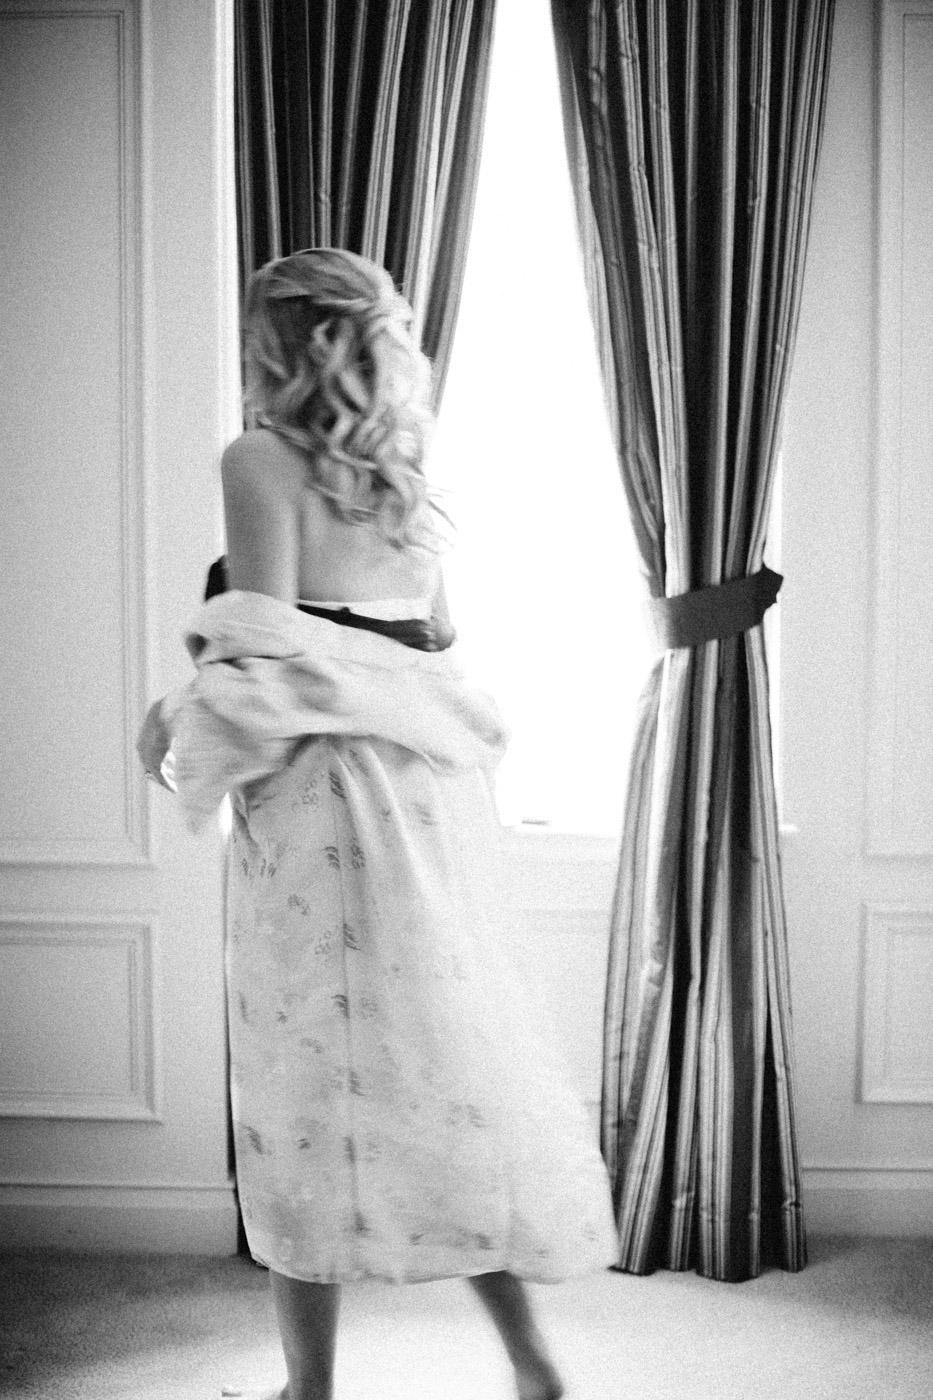 toronto_wedding_photographer_winter_wedding-11.jpg